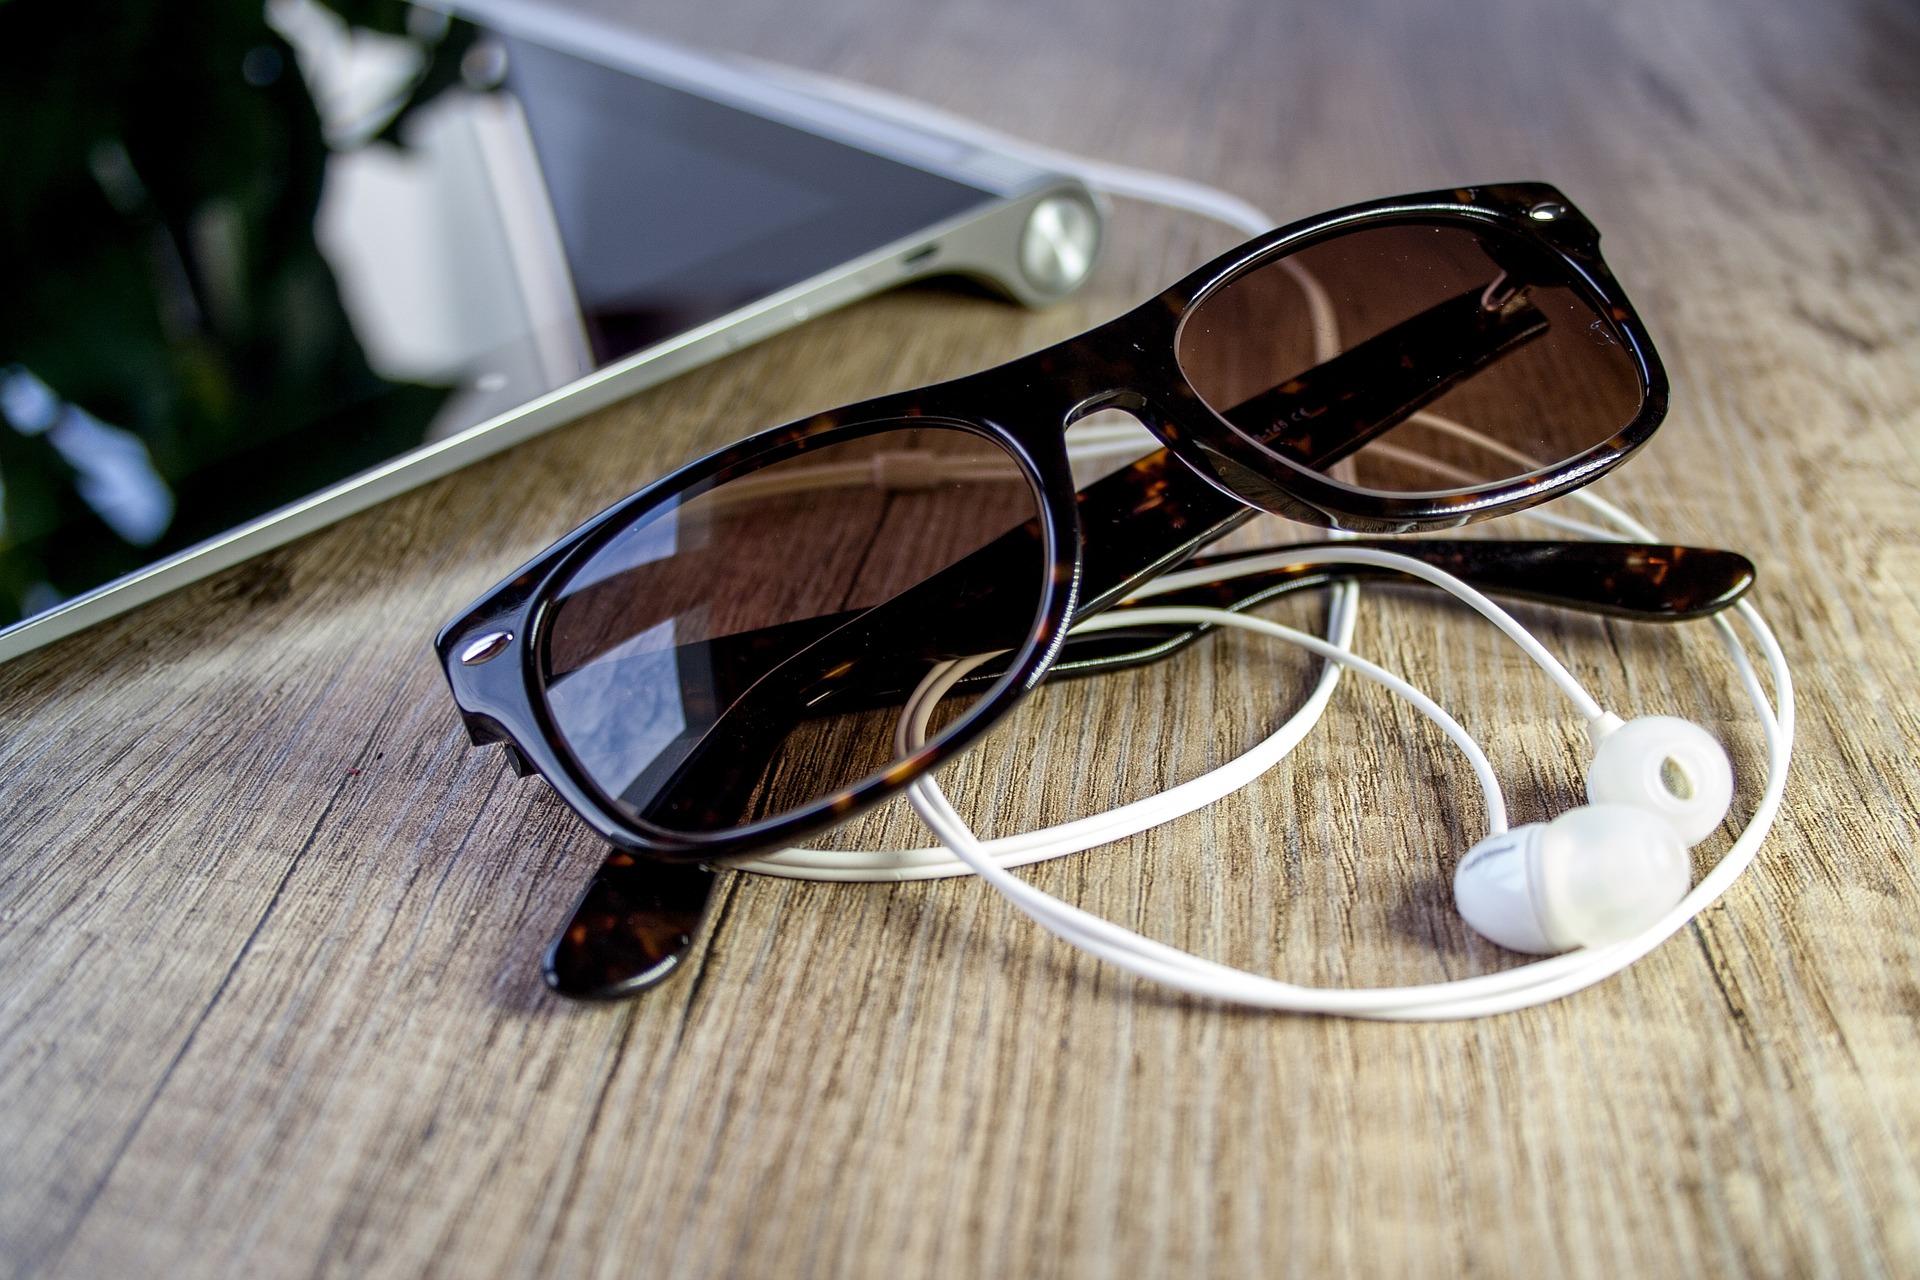 Glasses and headphones